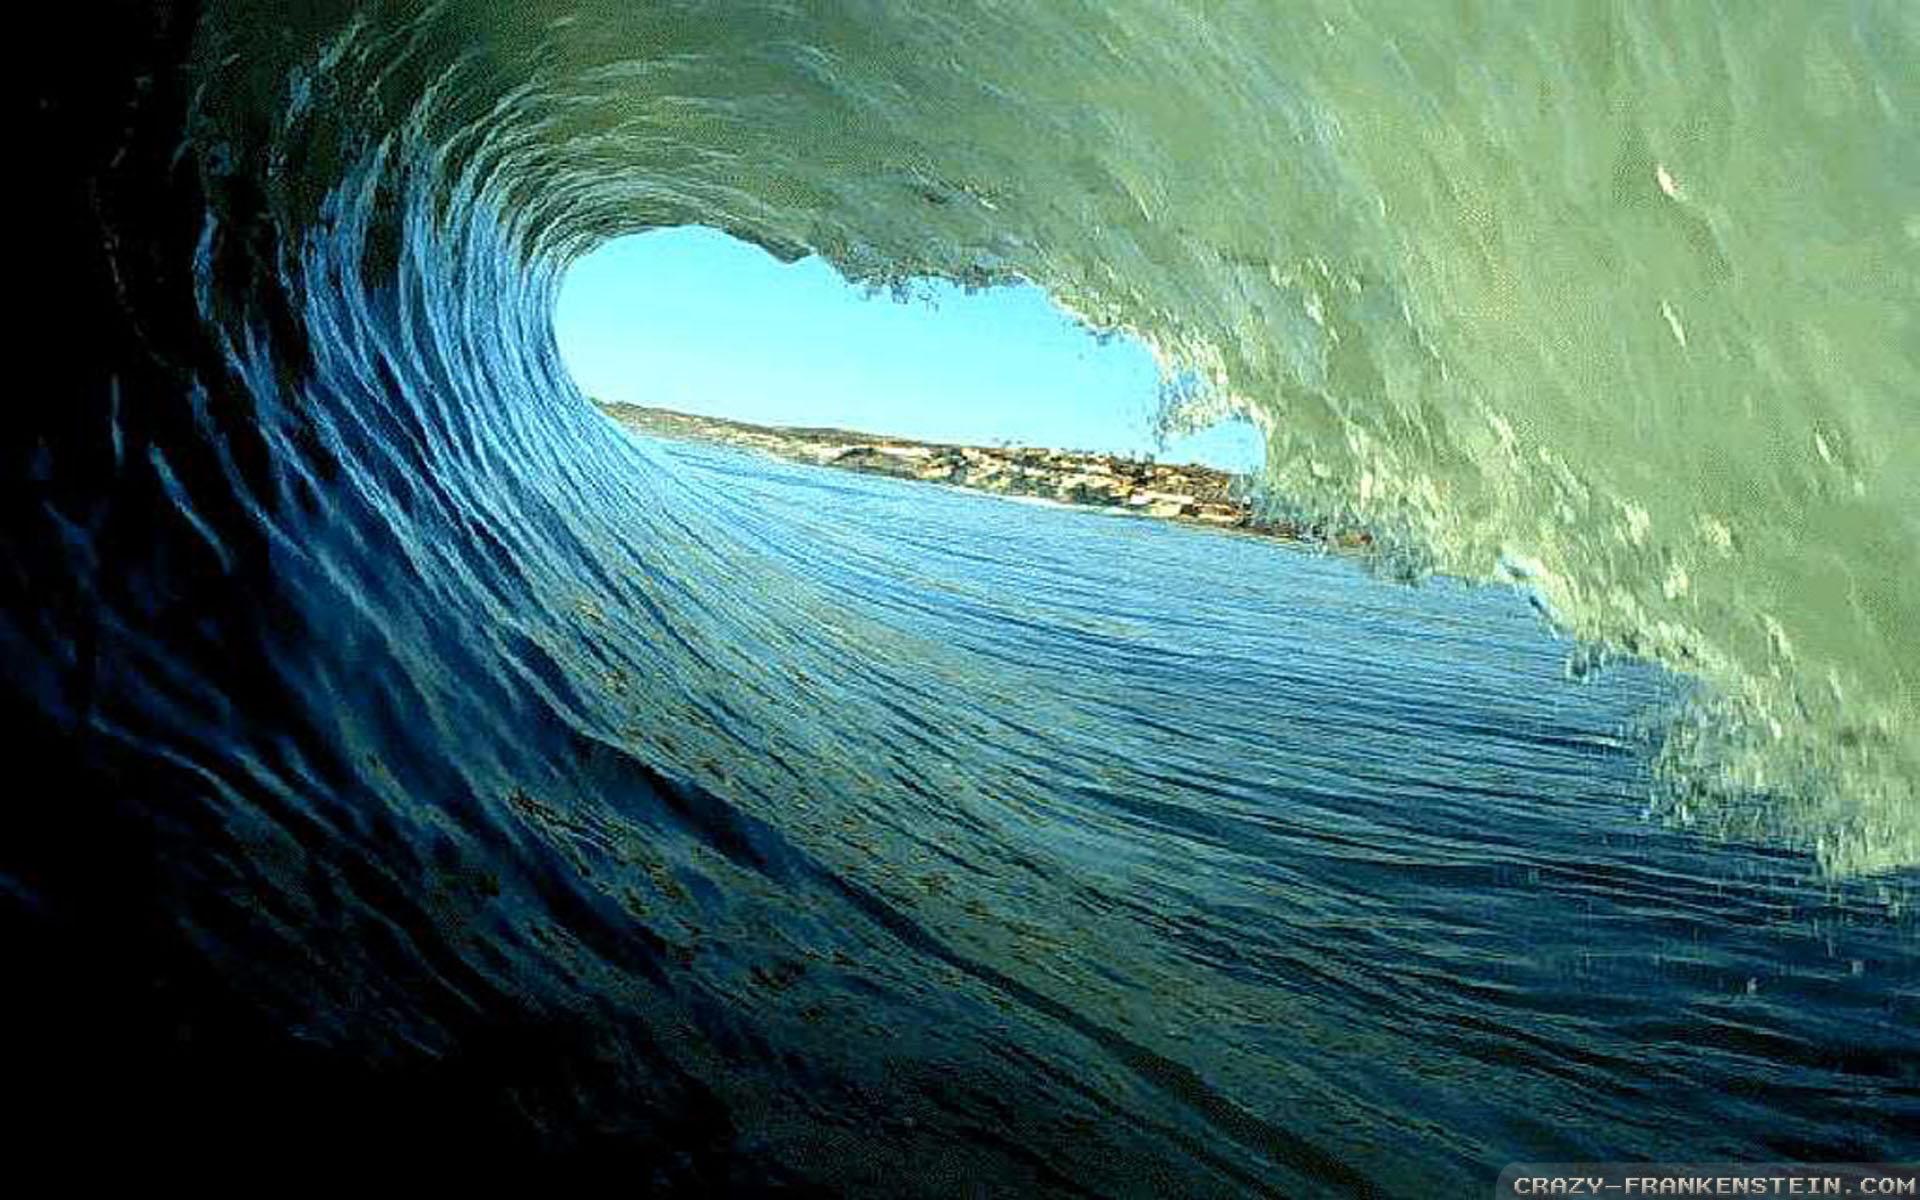 Wallpaper: Sea Wave Resolution: 1024x768 | 1280x1024 | 1600x1200. Widescreen Res: 1440x900 | 1680x1050 | 1920x1200